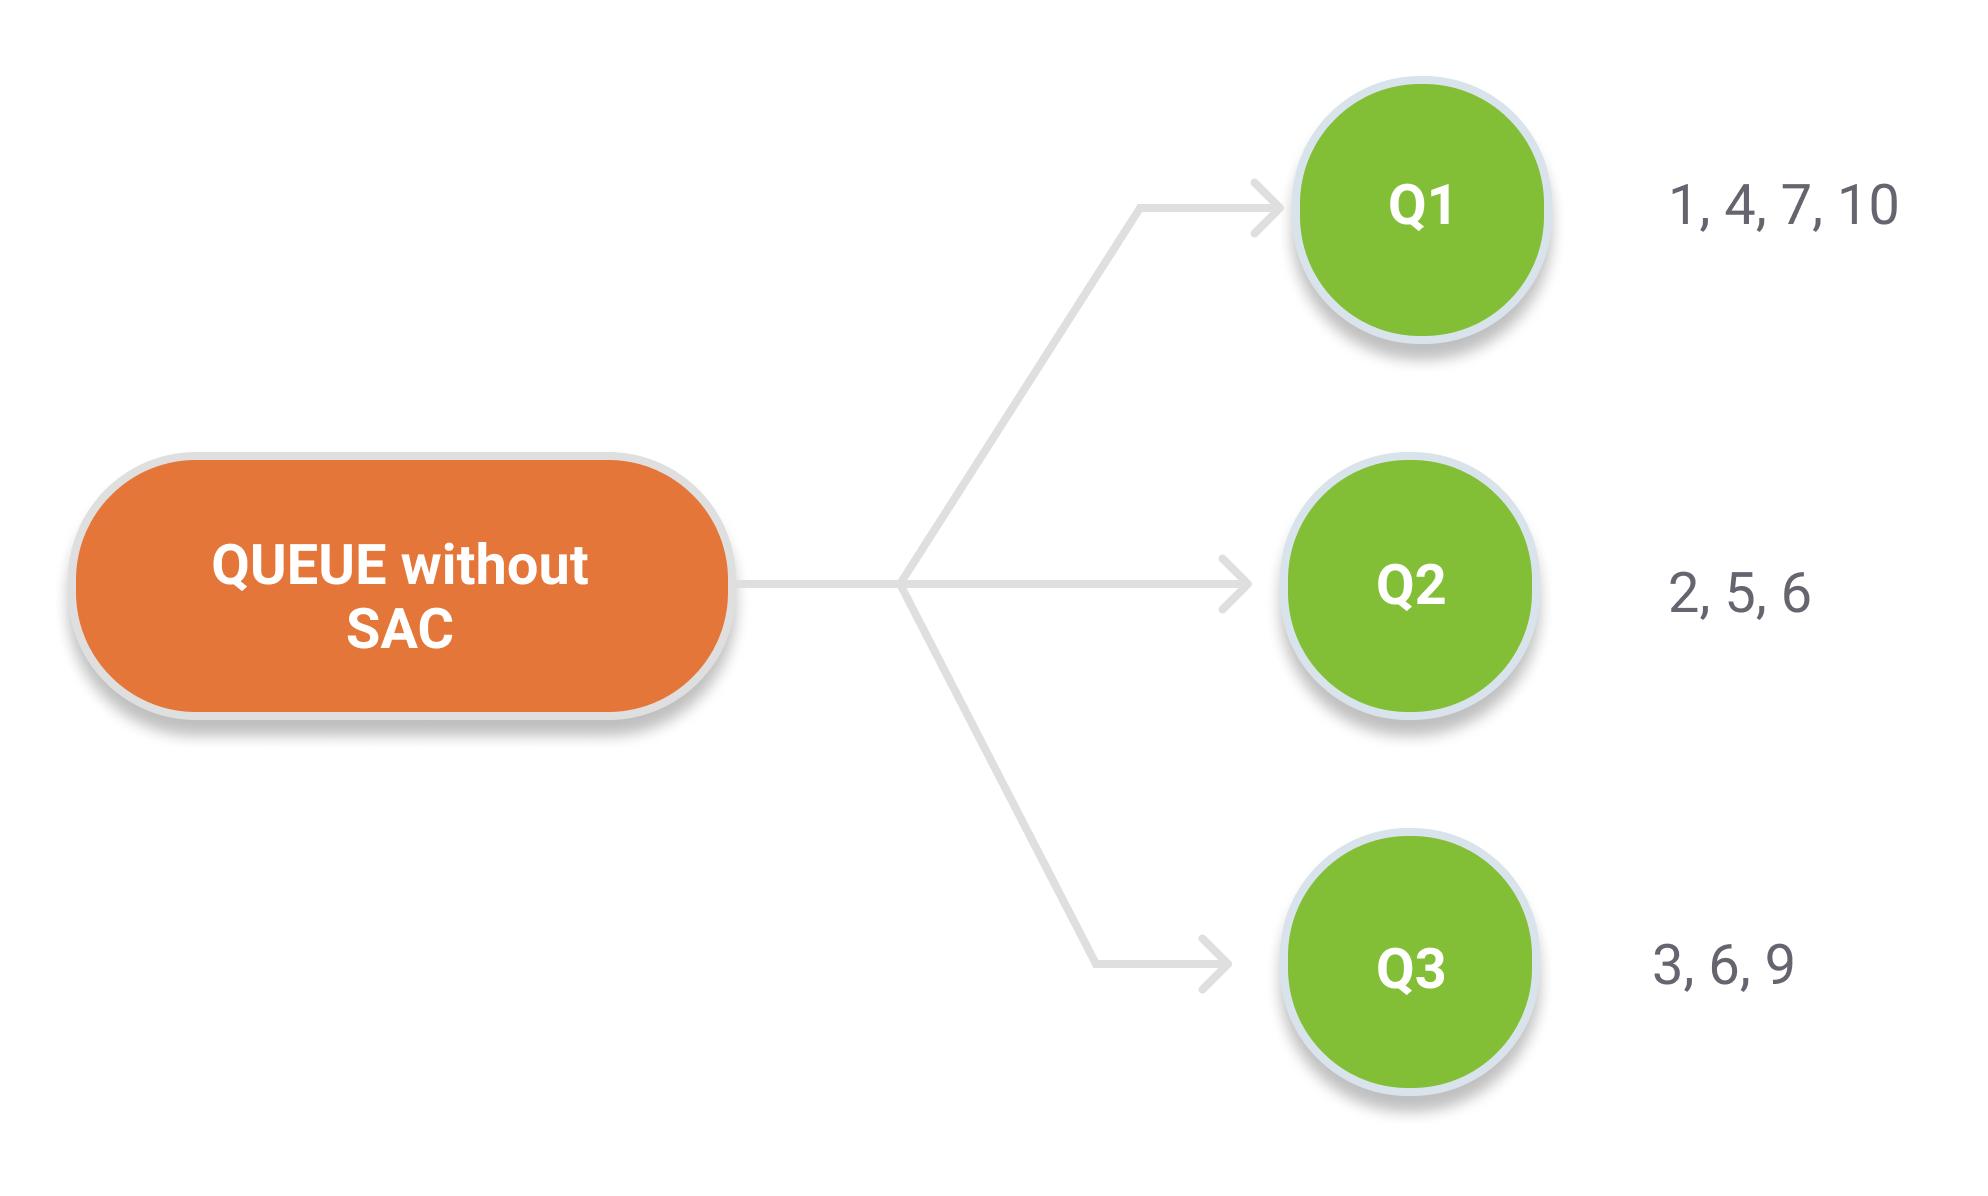 RabbitMQ 3 8 Feature Focus - Single Active Consumer - CloudAMQP